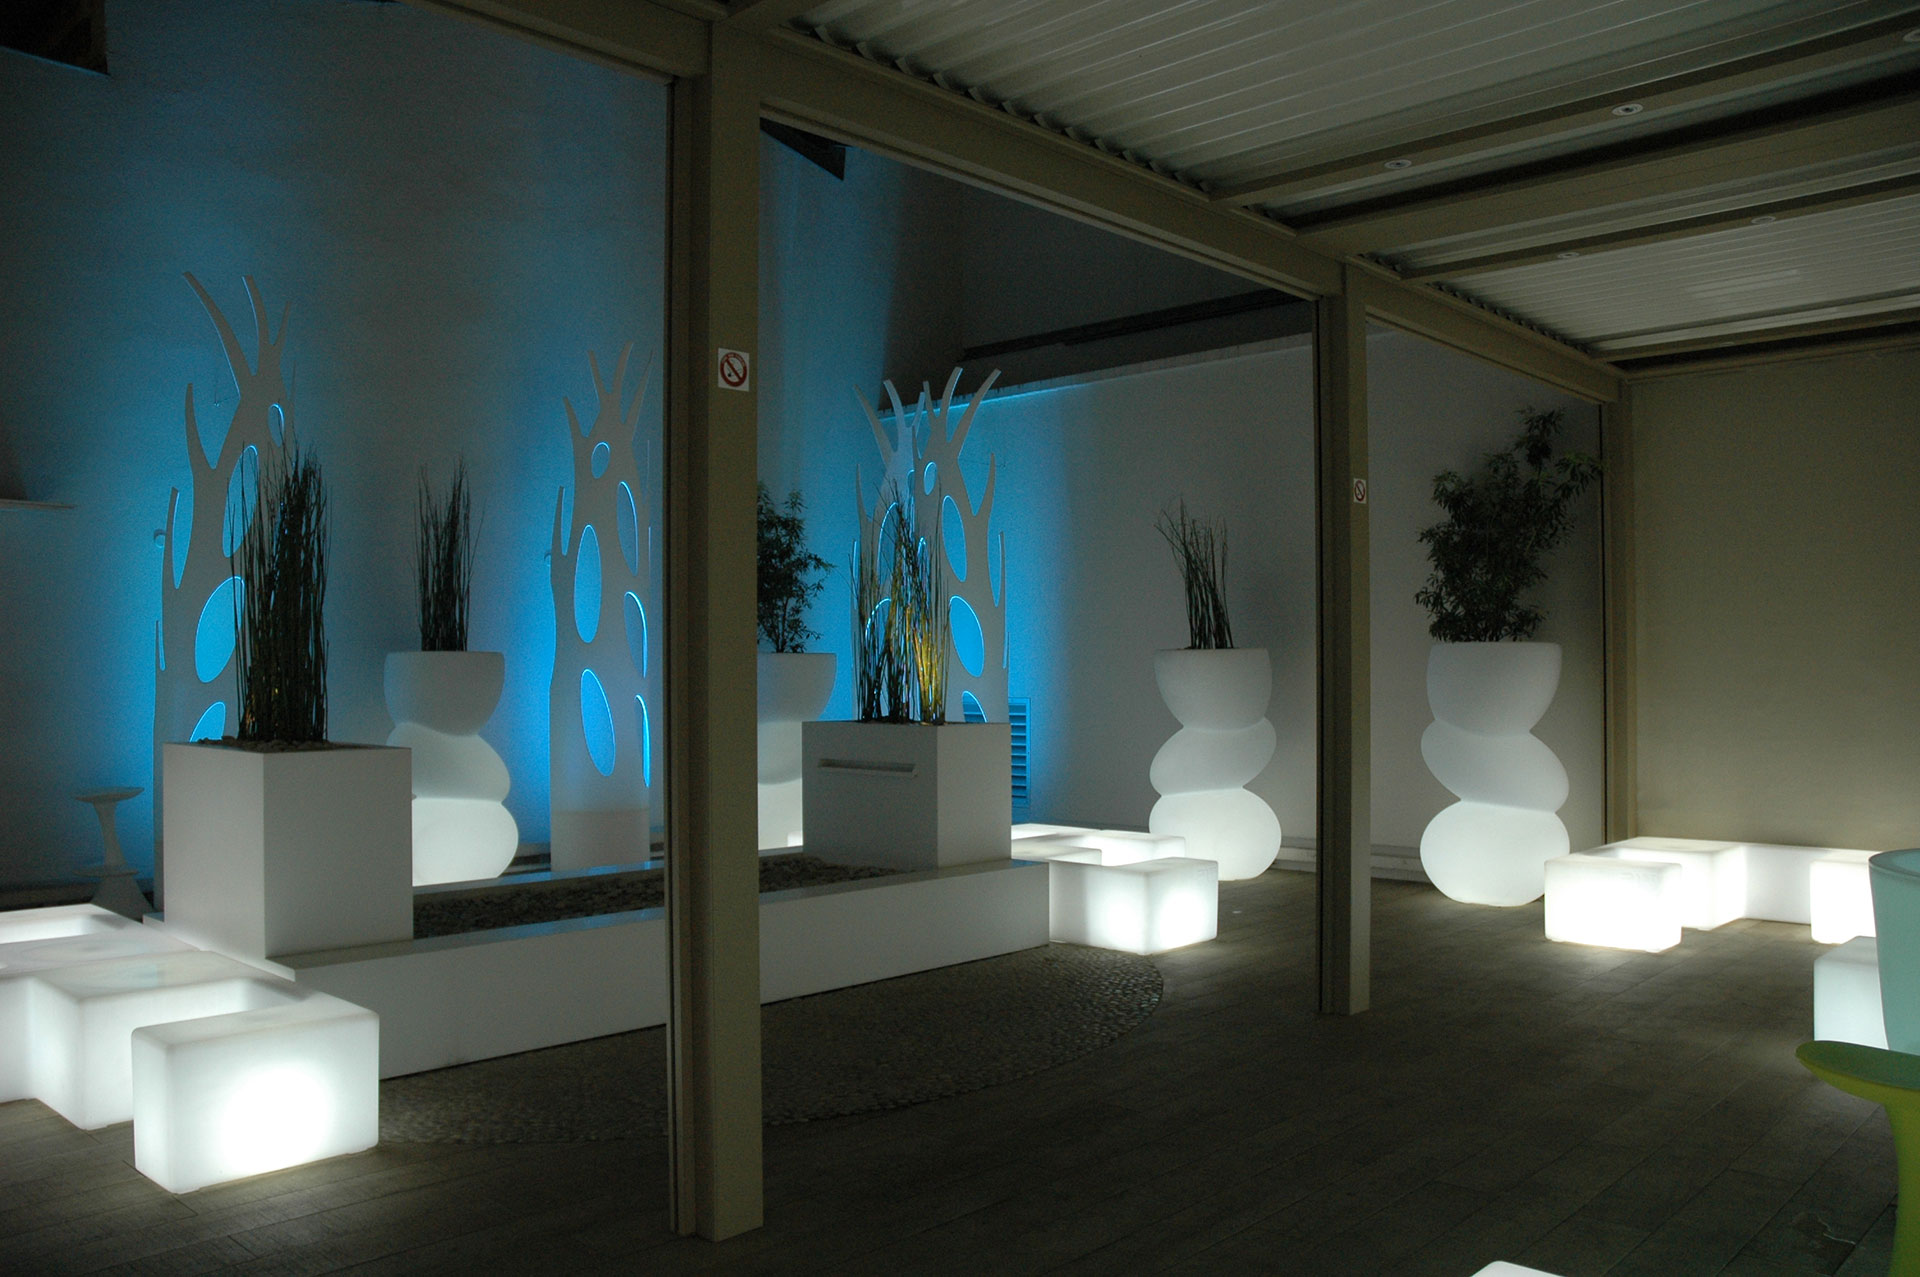 xl-catlin-decoration-interieure-sur-mesure-quasart-creations-web